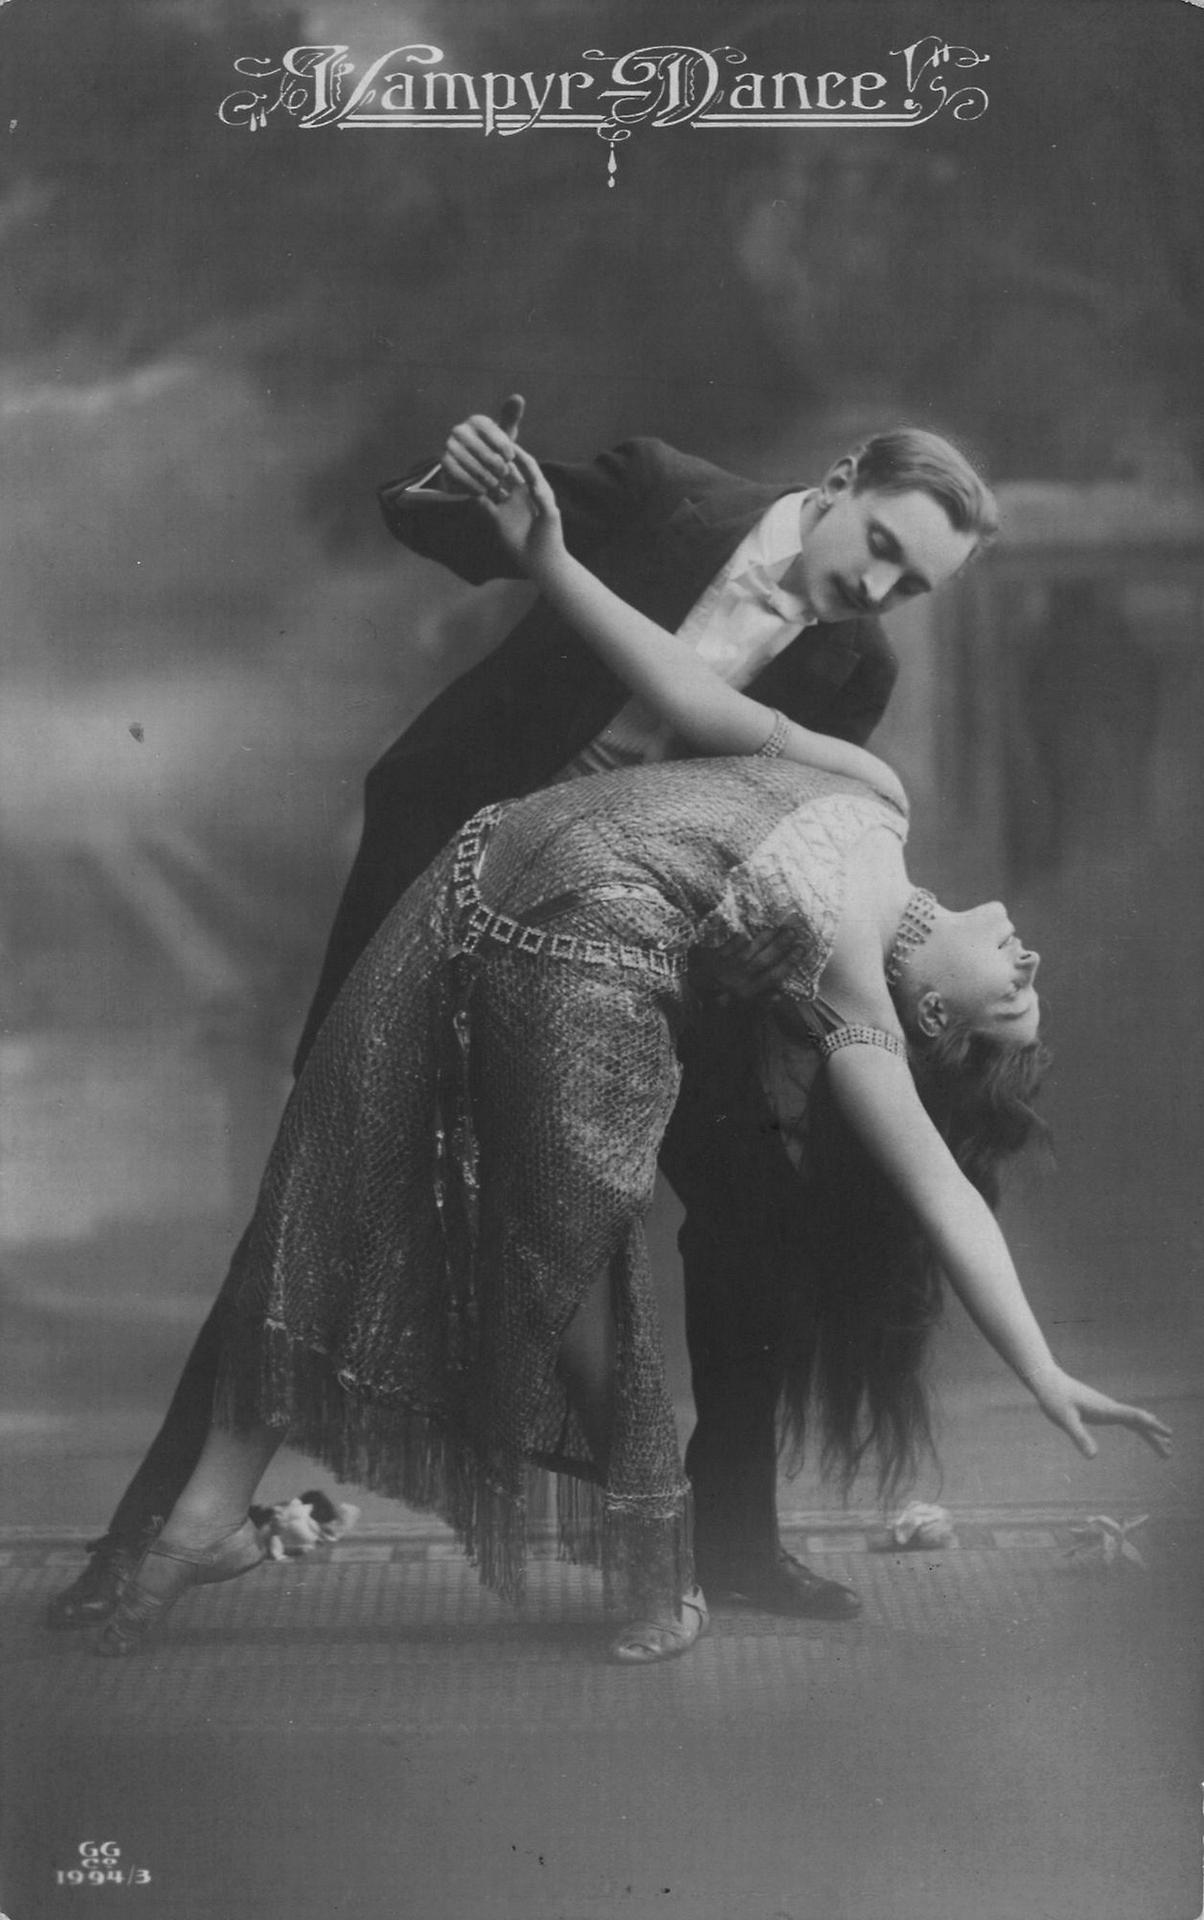 Vampyr Dance